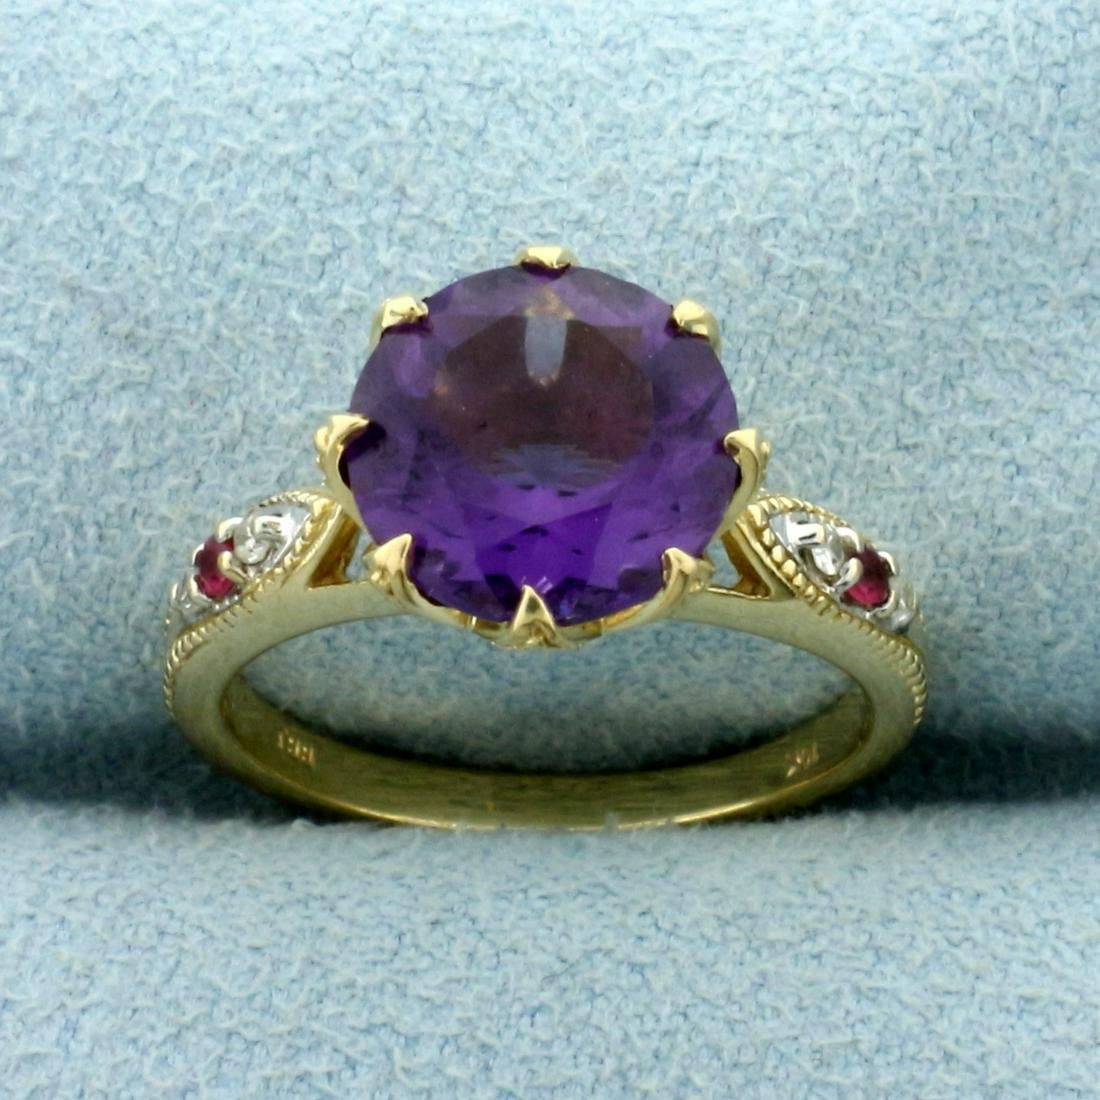 Vintage Amethyst, Garnet, and Diamond Ring in 10K